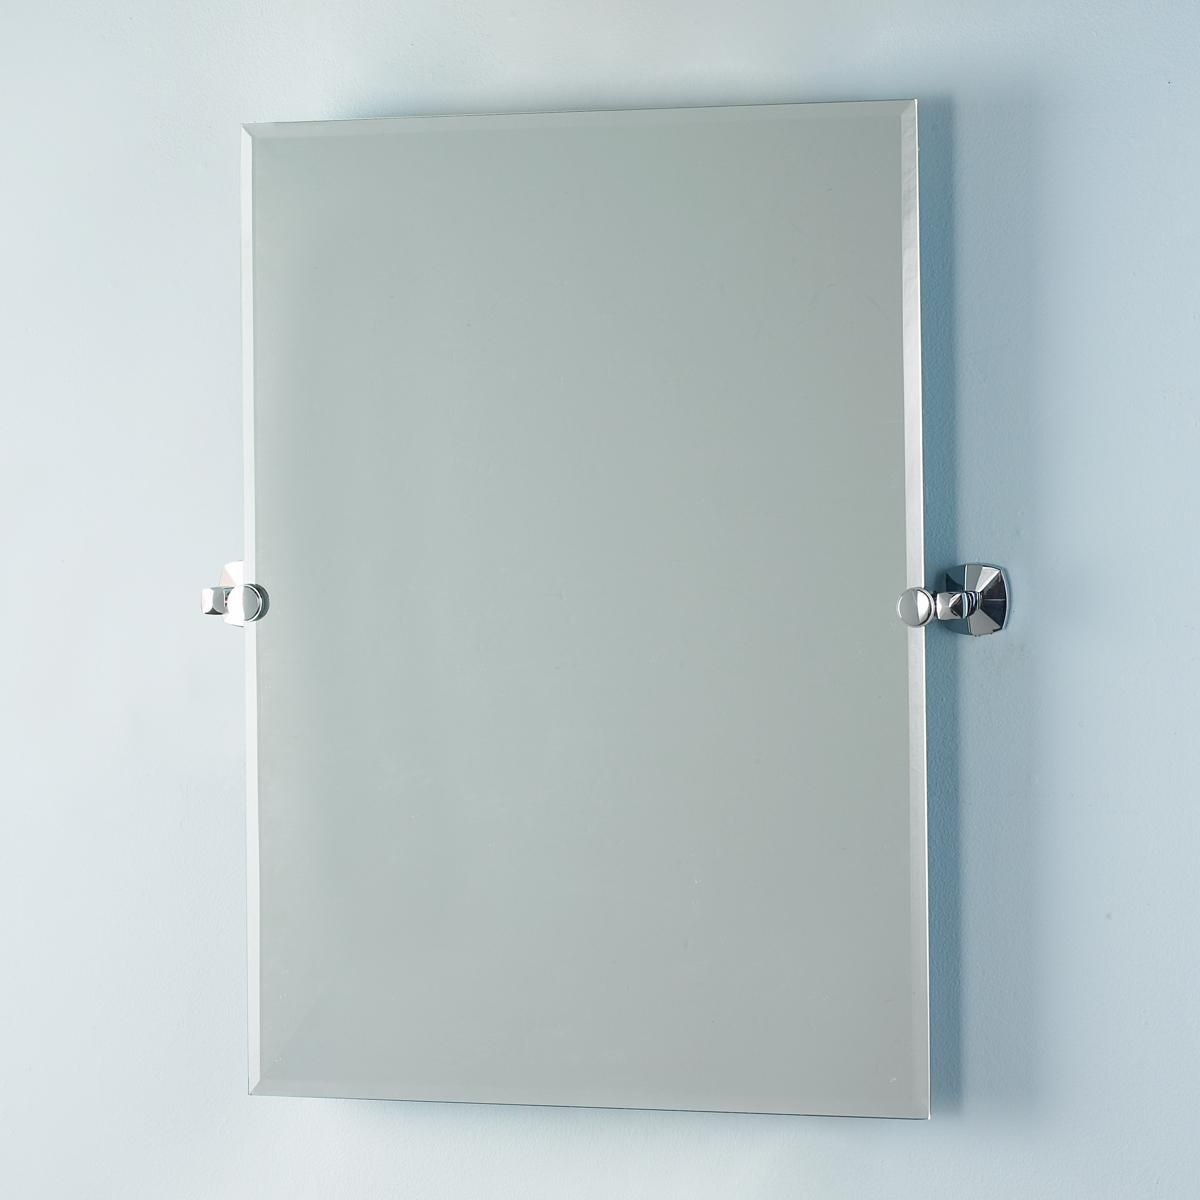 Rectangular Tilting Wall Mirror